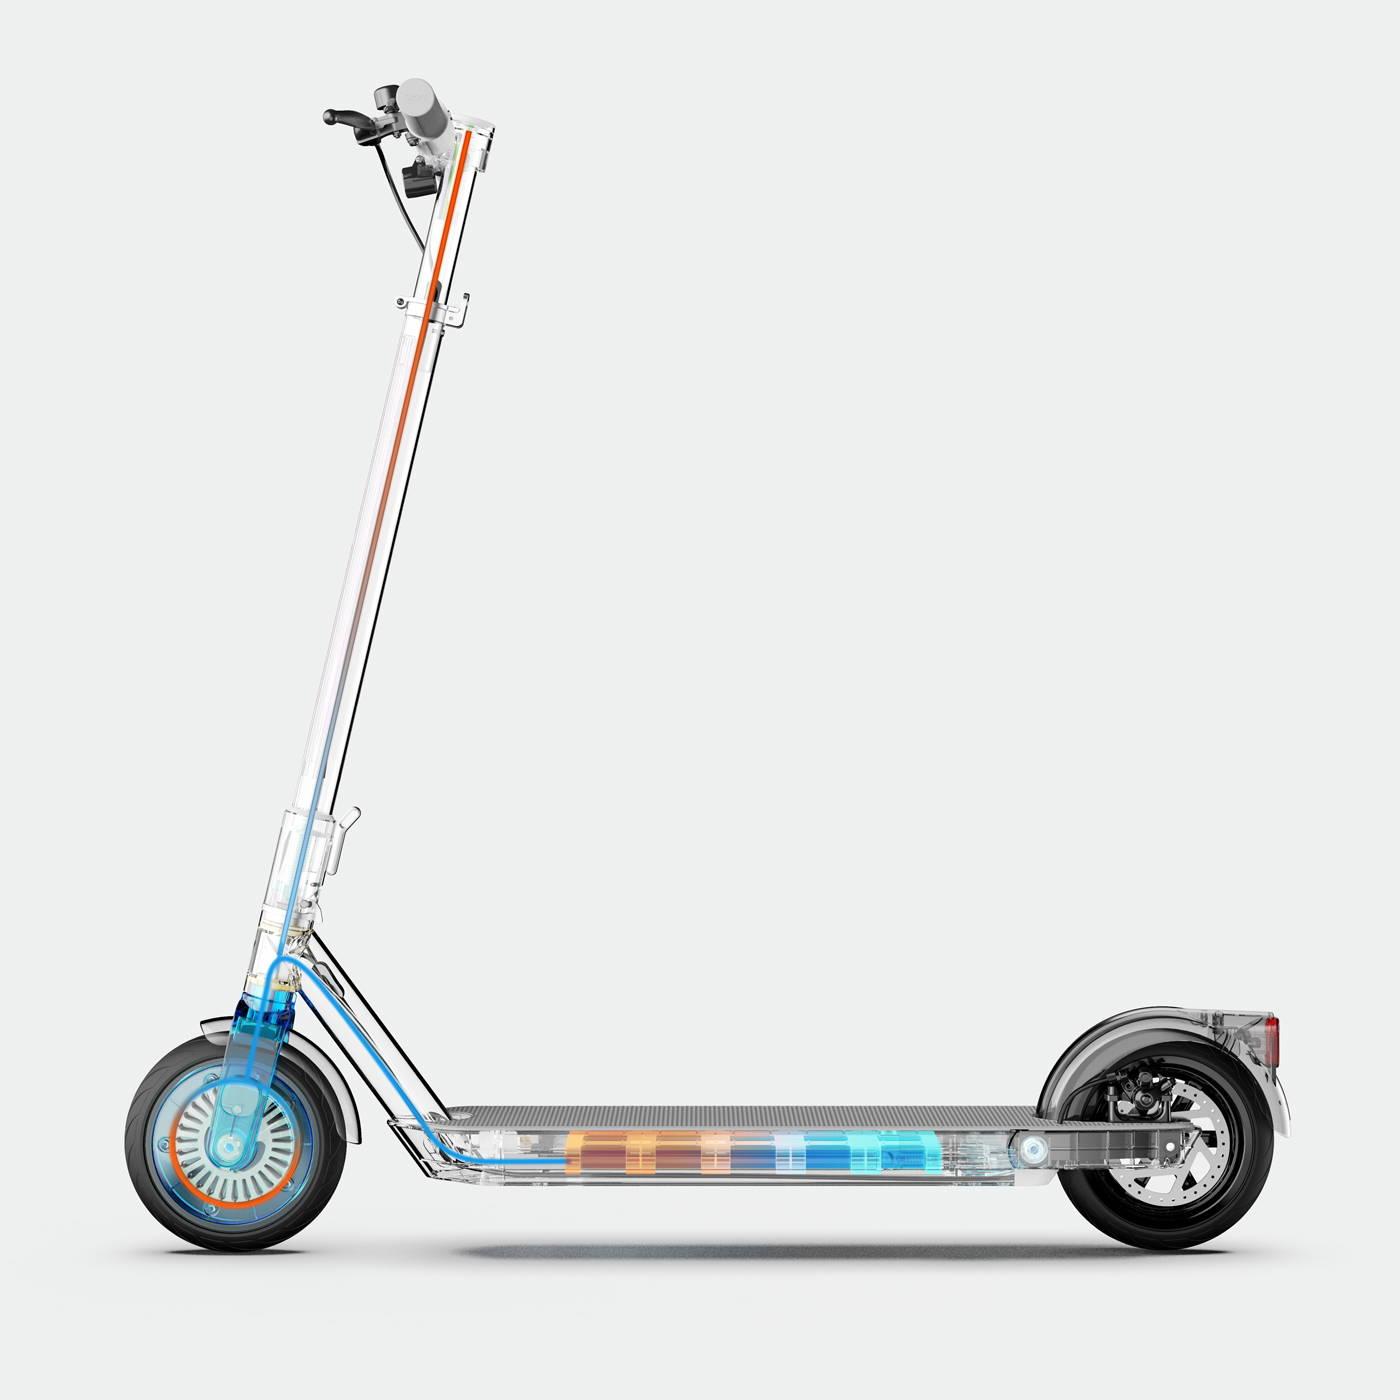 Okai-es200-electric-scooter-deck-handlebars